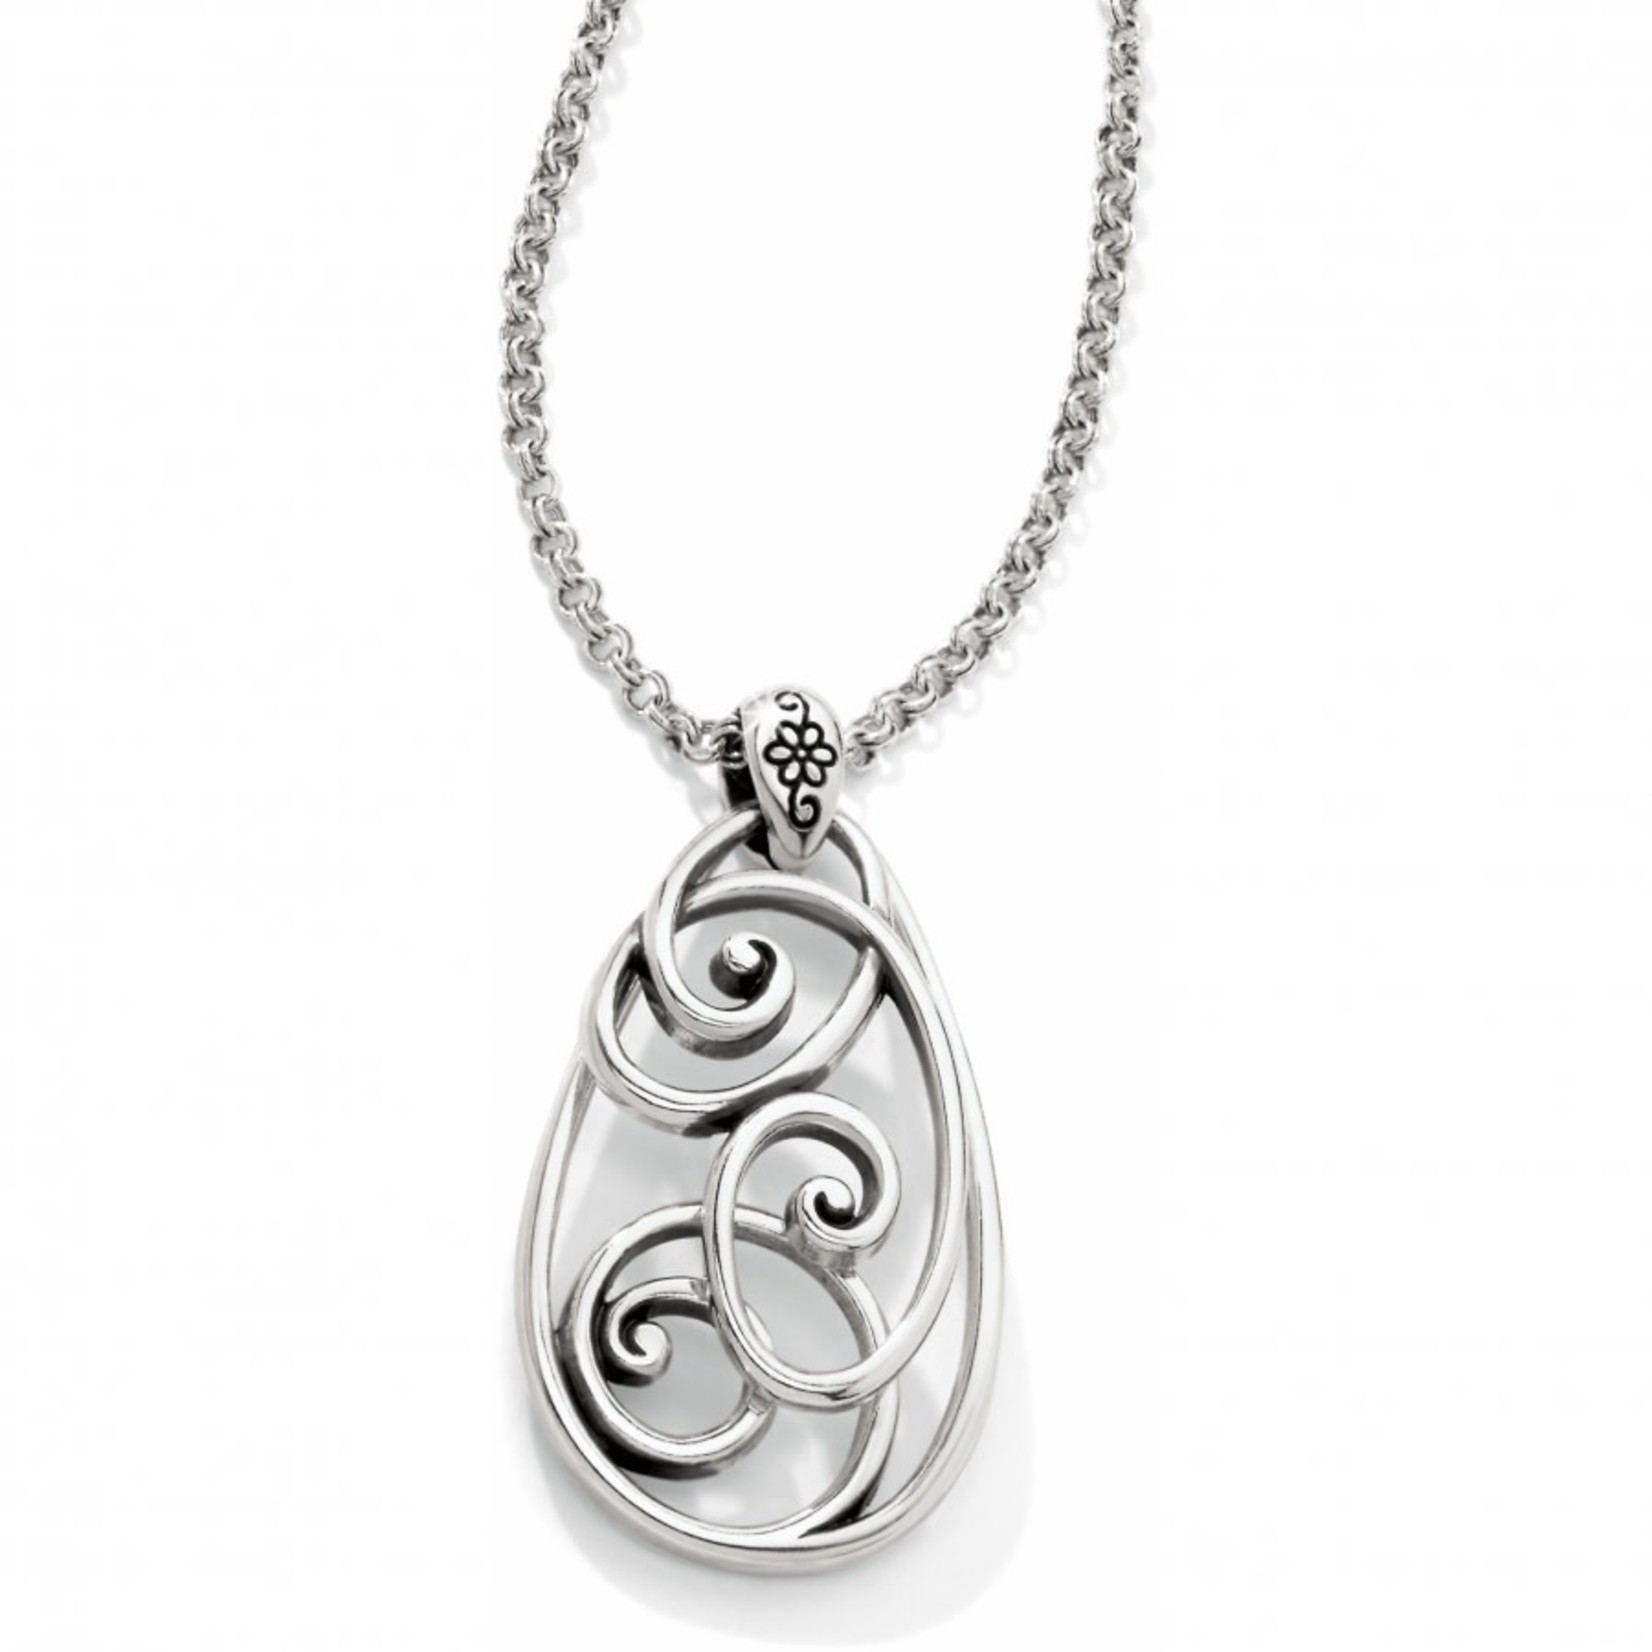 Brighton Rock N Scroll Necklace